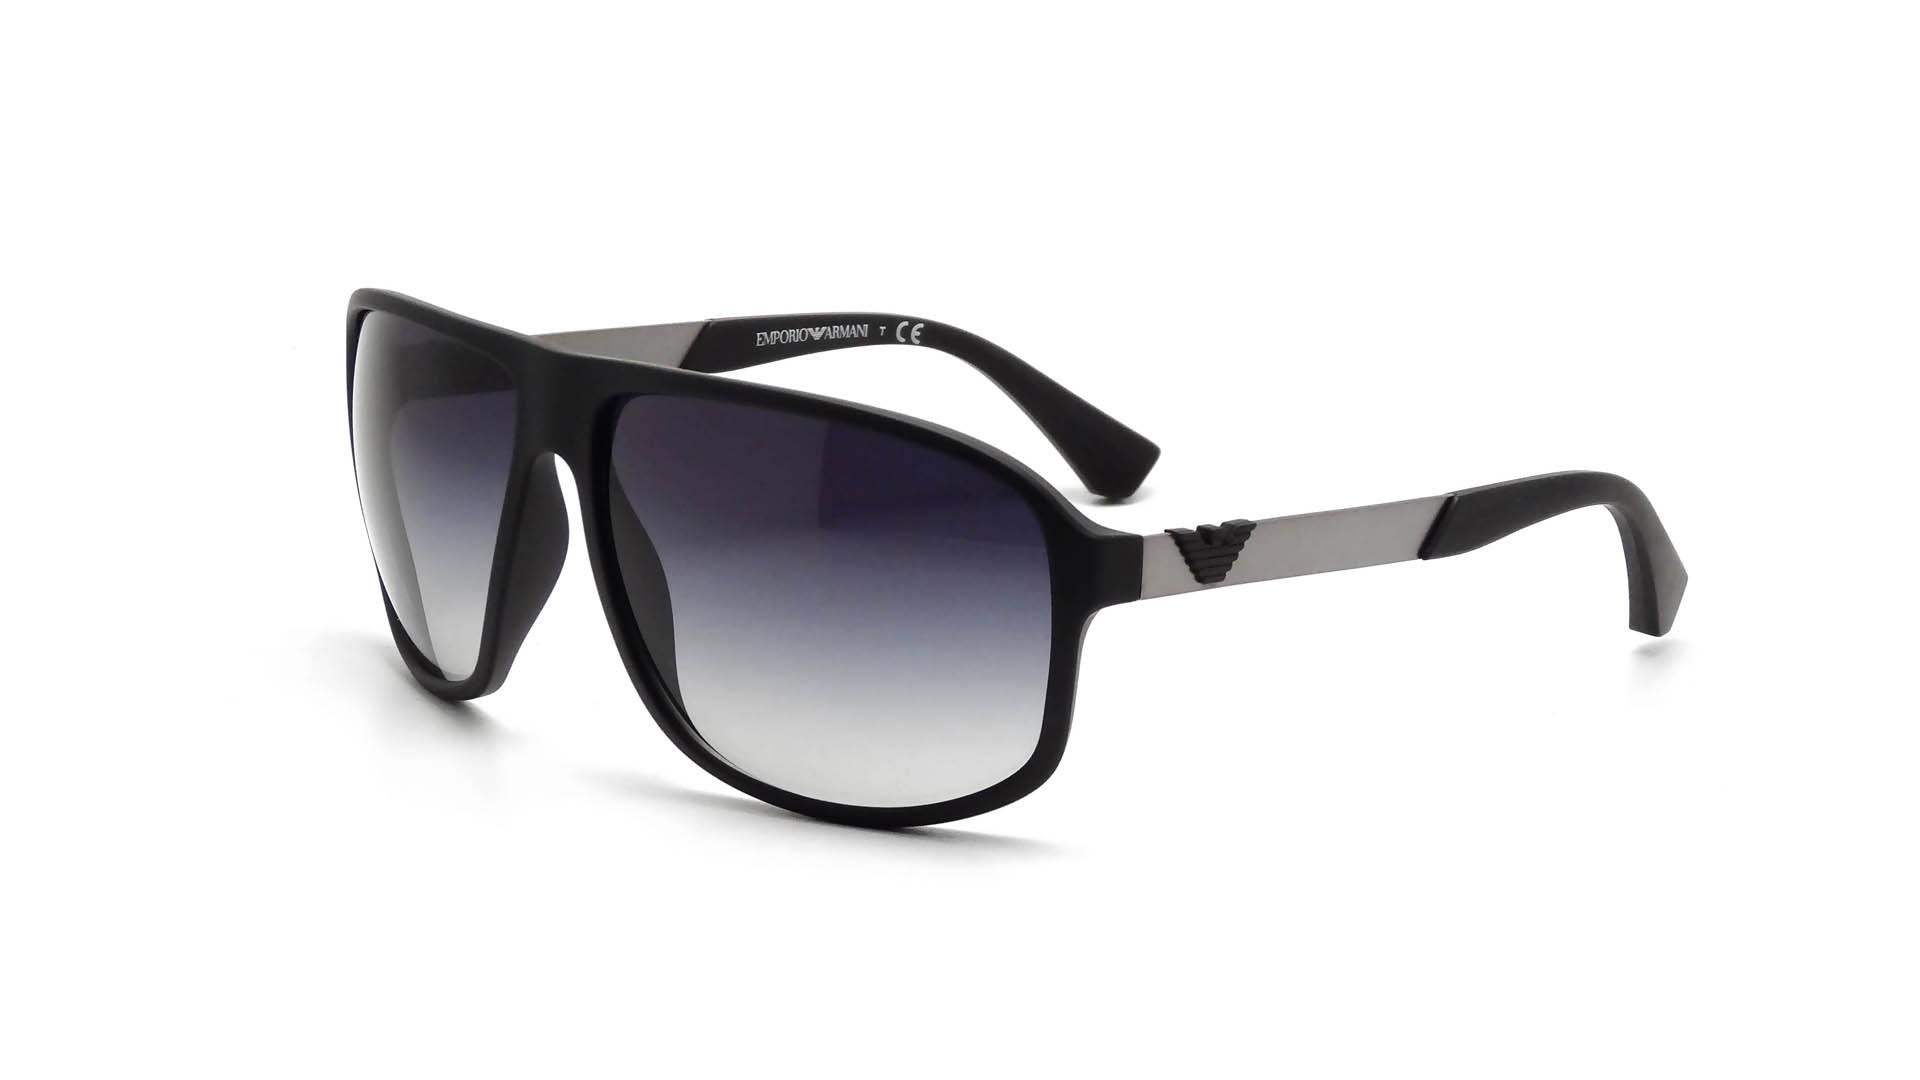 498d3ccbdc0 Ray Ban 5063 Eyeglasses « Heritage Malta